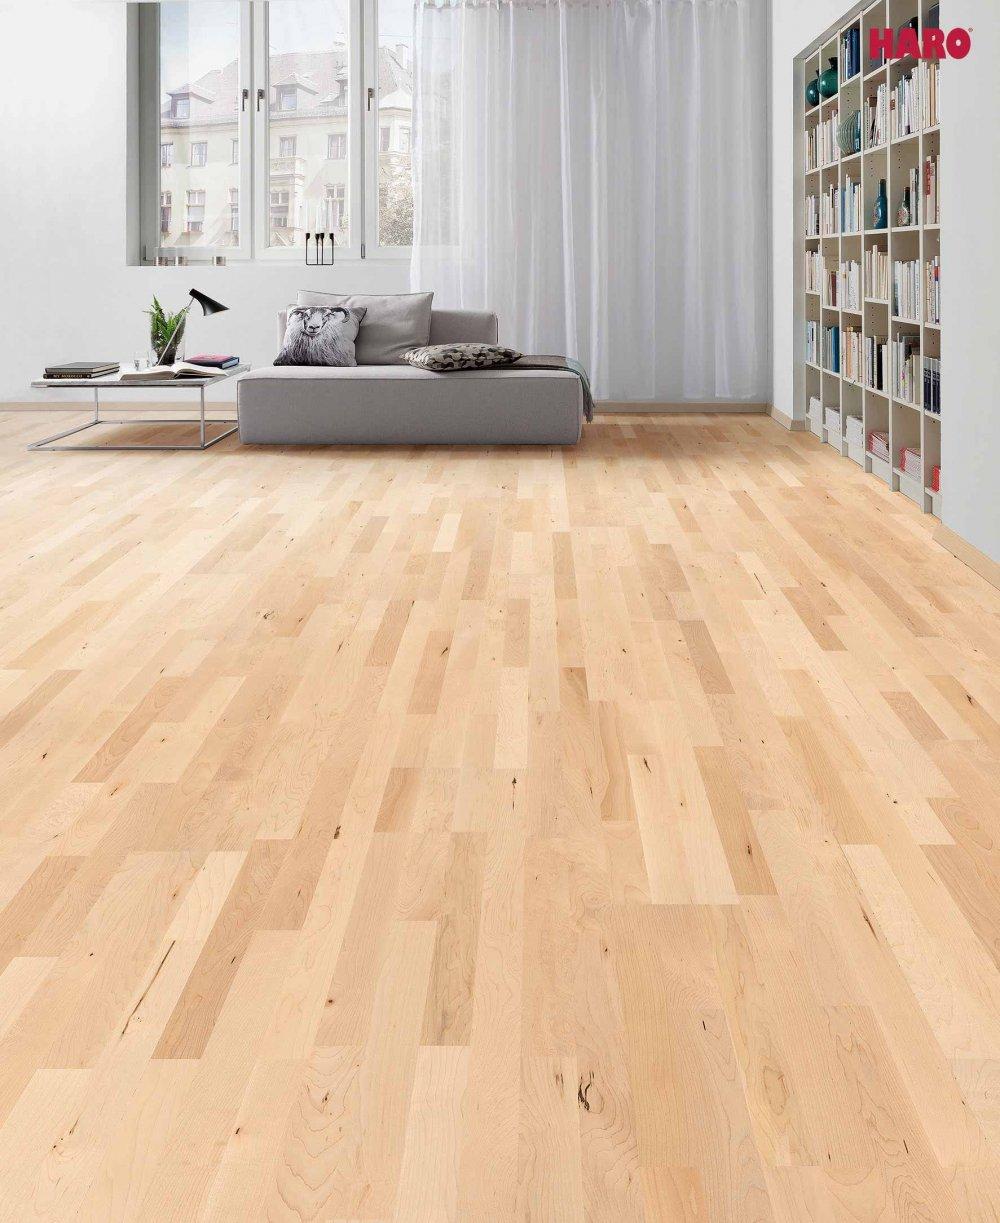 524406 haro parkett 3 stab schiffsboden 4000 canadischer ahorn tundra lackiert. Black Bedroom Furniture Sets. Home Design Ideas